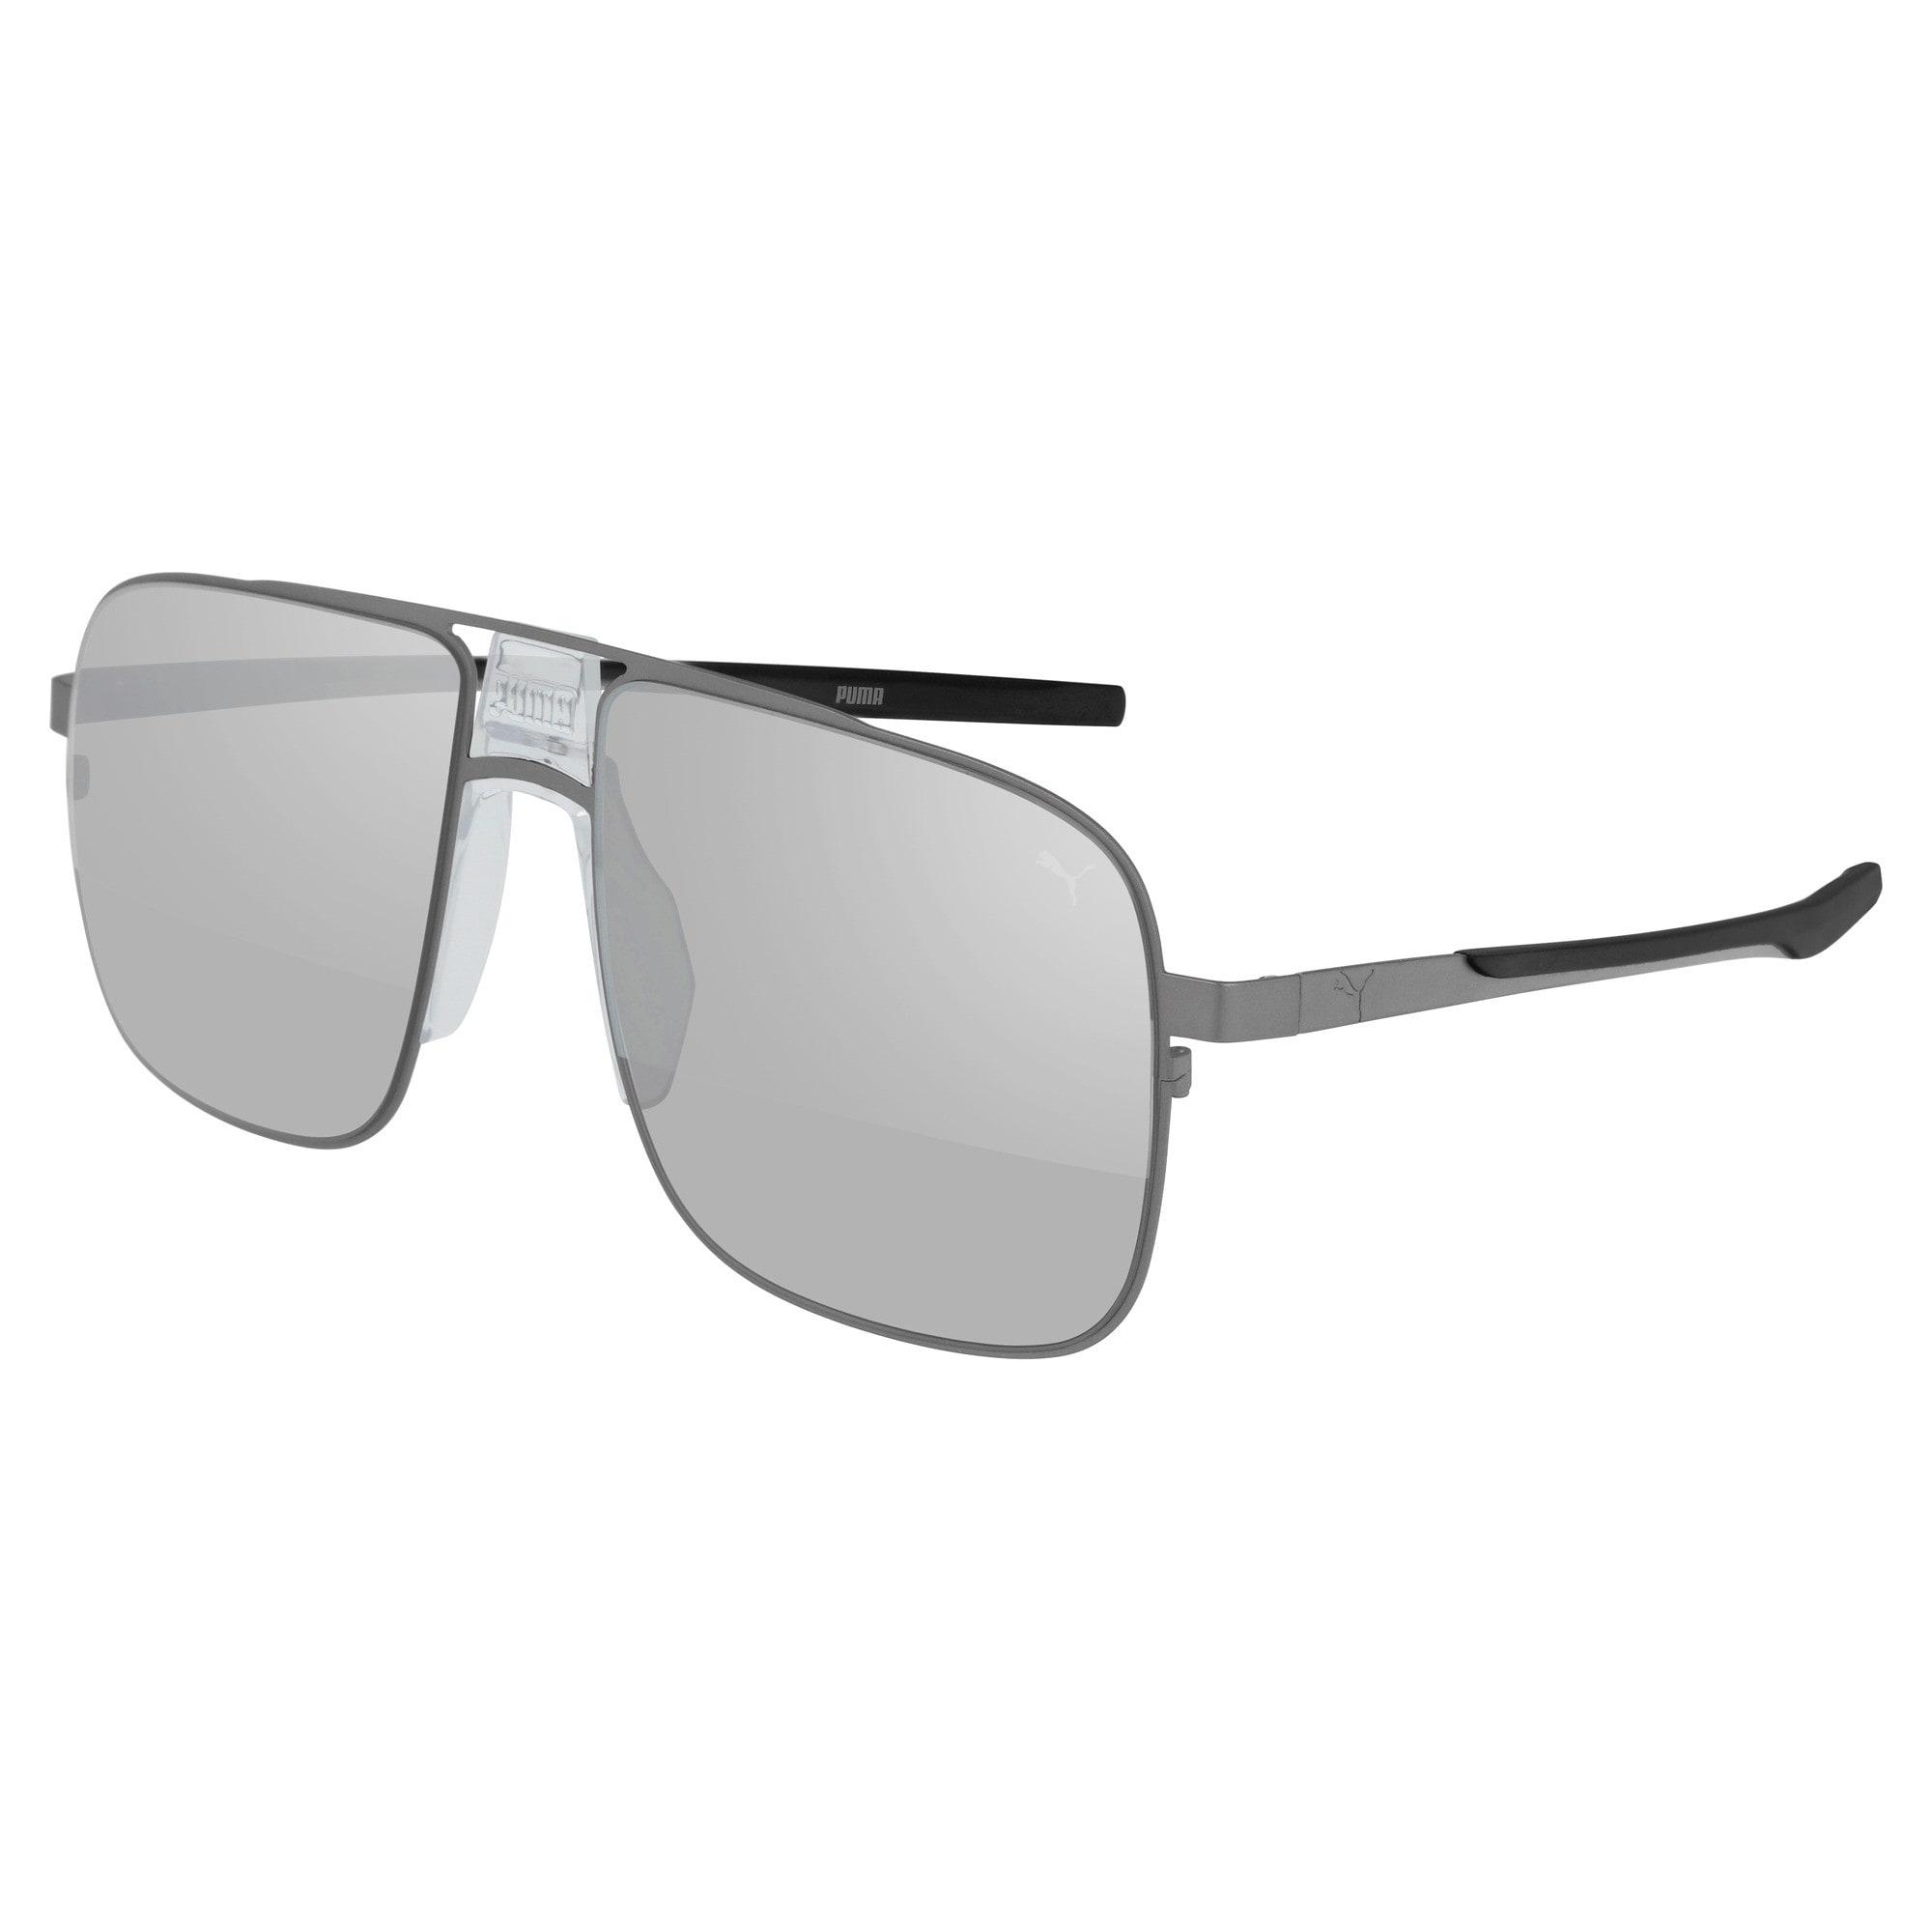 Thumbnail 1 of Men's Sunglasses, RUTHENIUM-RUTHENIUM-SILVER, medium